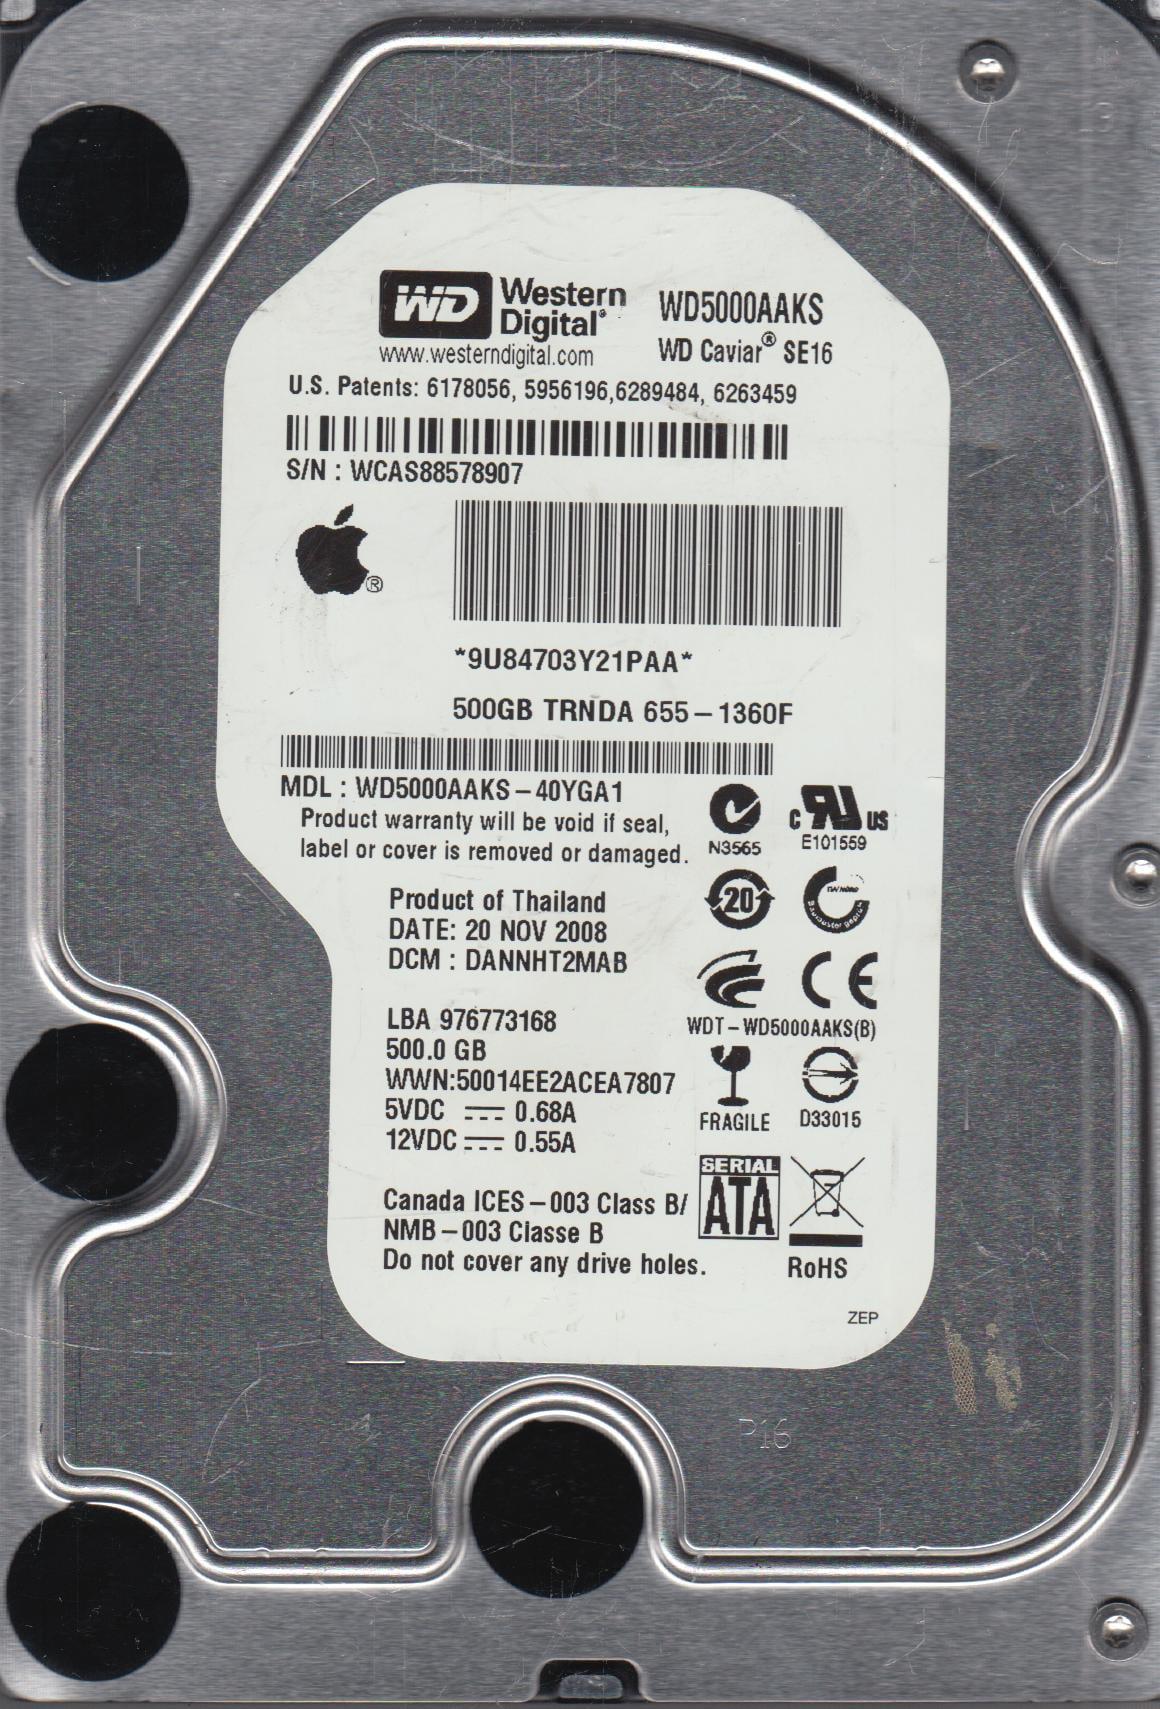 WD5000AAKS-40YGA1, DCM DANNHT2MAB, Western Digital 500GB SATA 3.5 Hard Drive by WD